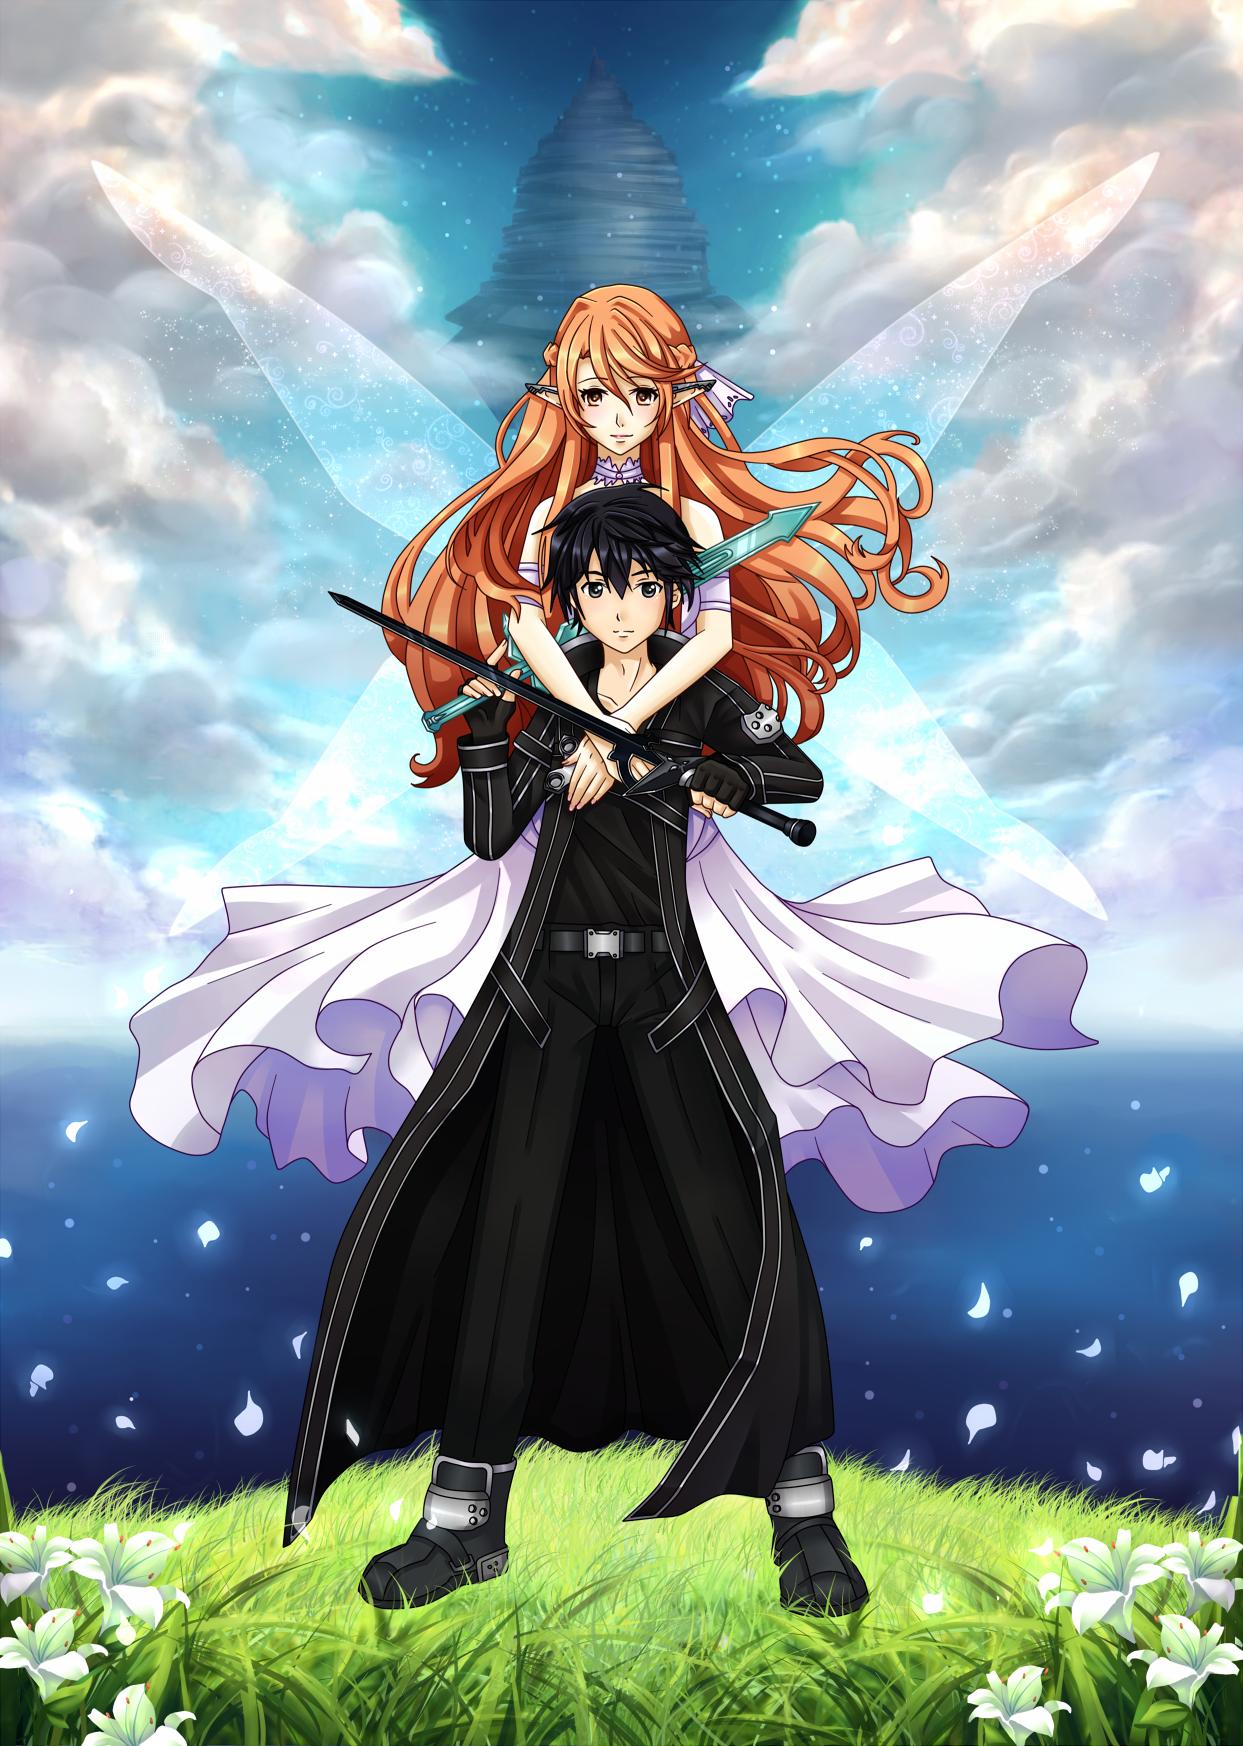 SAO - Kirito and Asuna by Ichigokitten